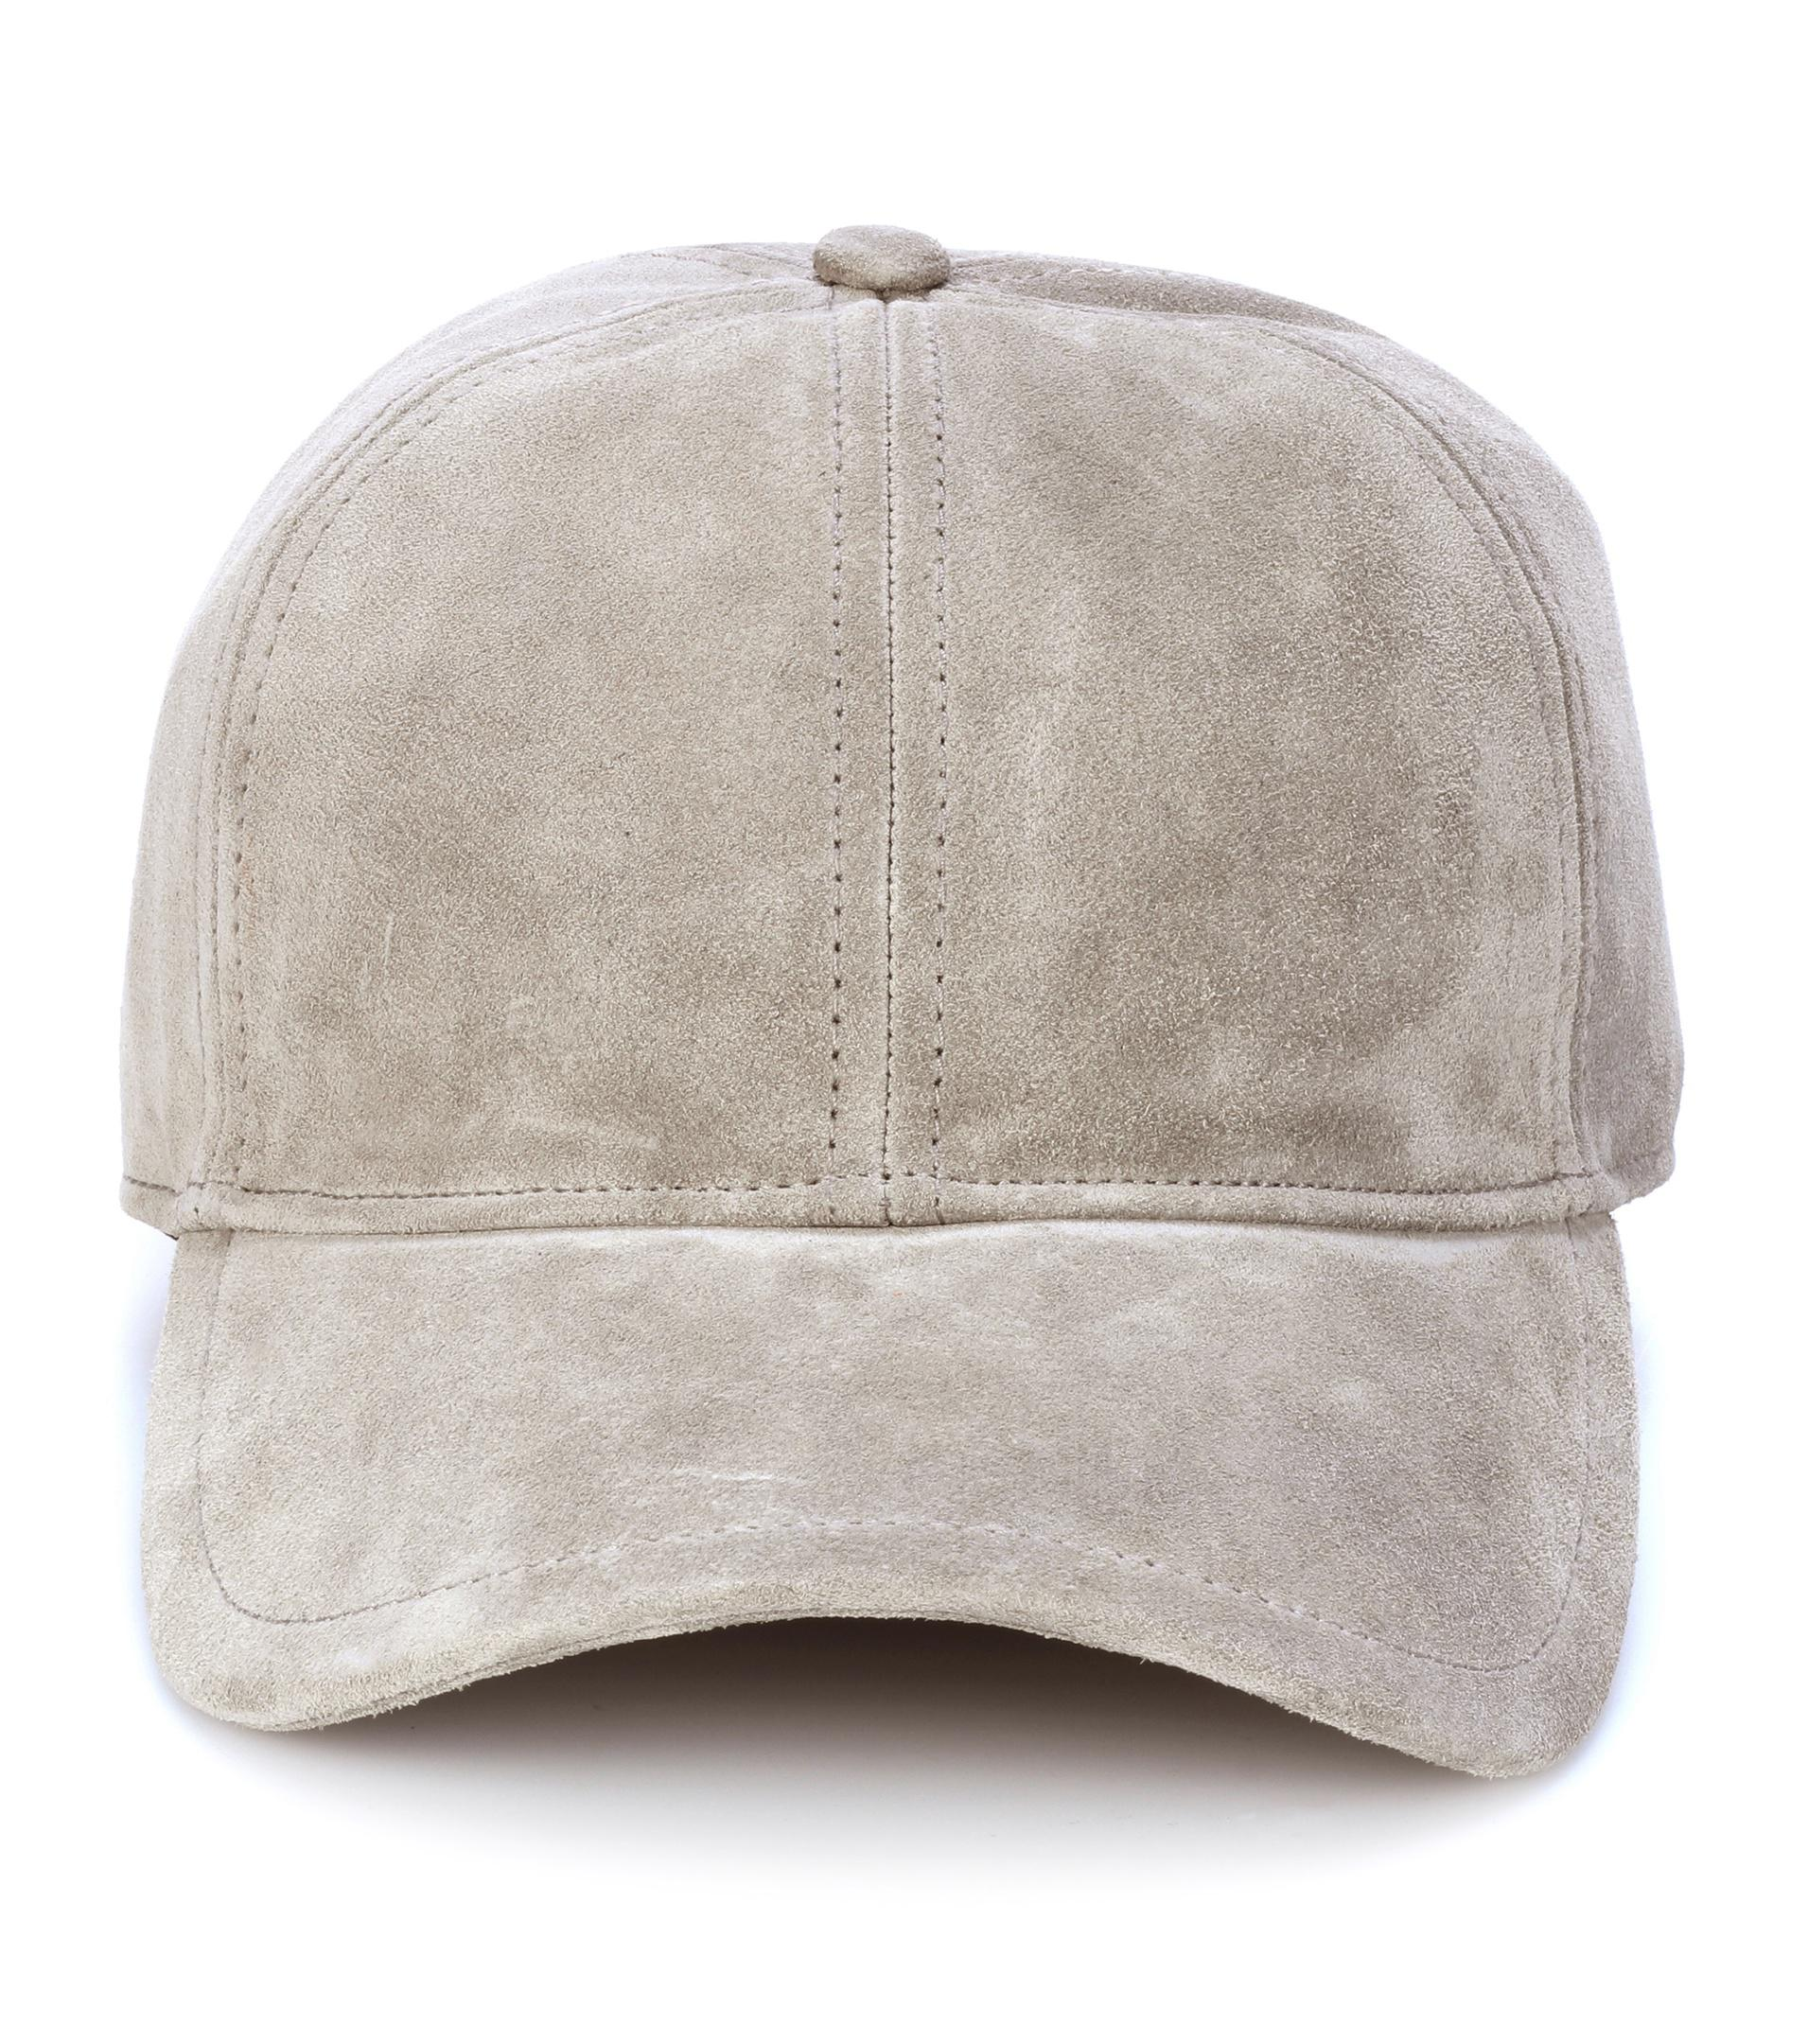 Rag   Bone Suede Cap in Gray - Lyst 0db7e1b7d8f